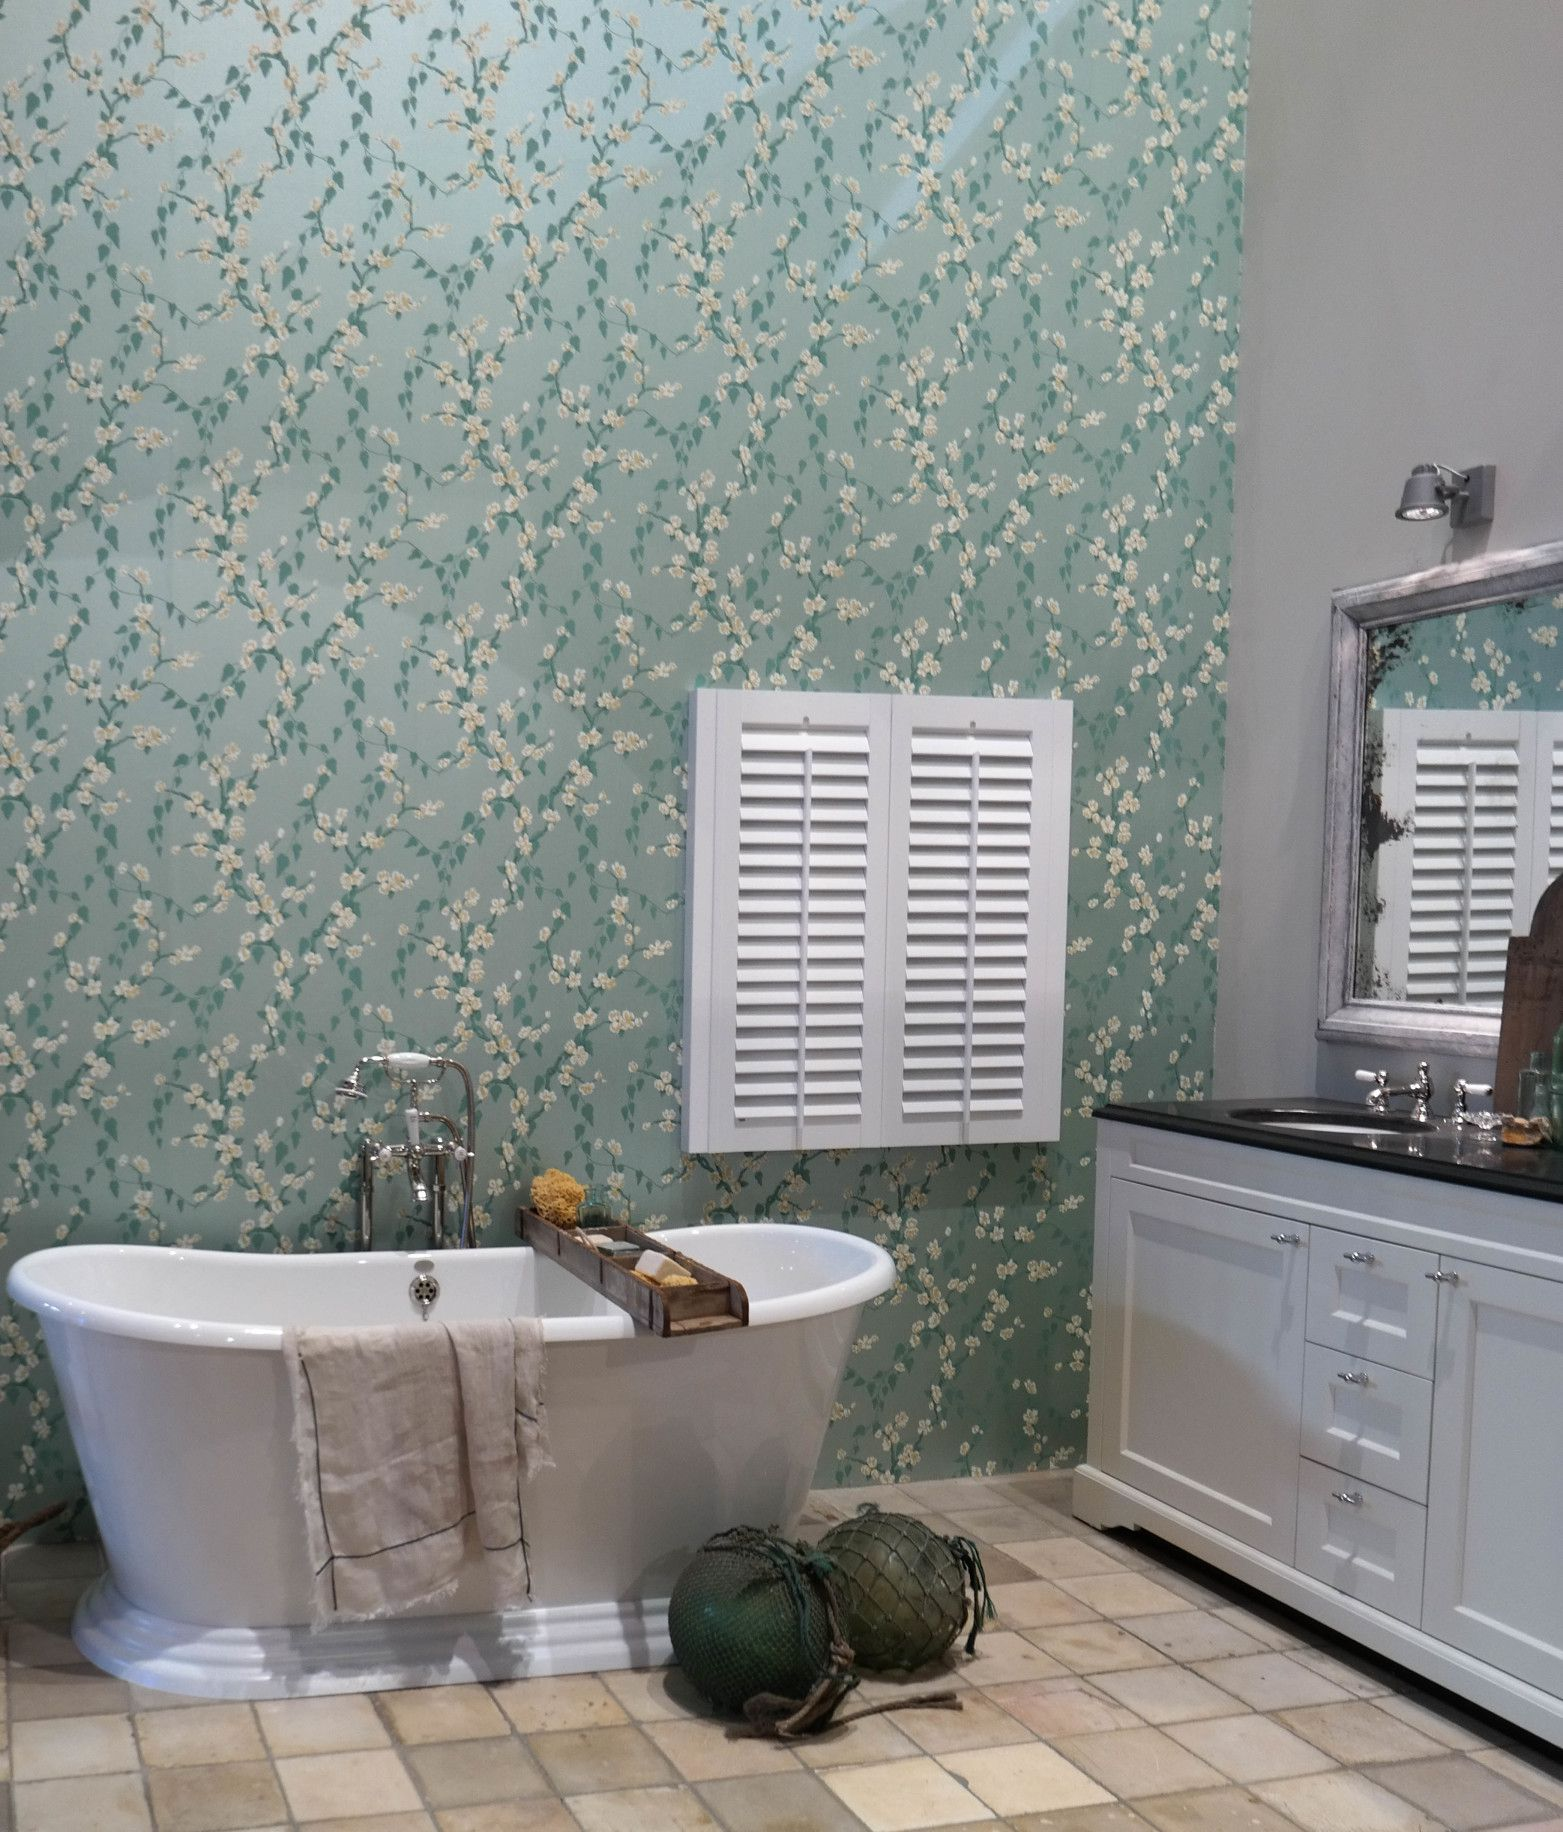 Green Bathroom Ideas: 12 Ideas For Gorgeous Green Bathrooms